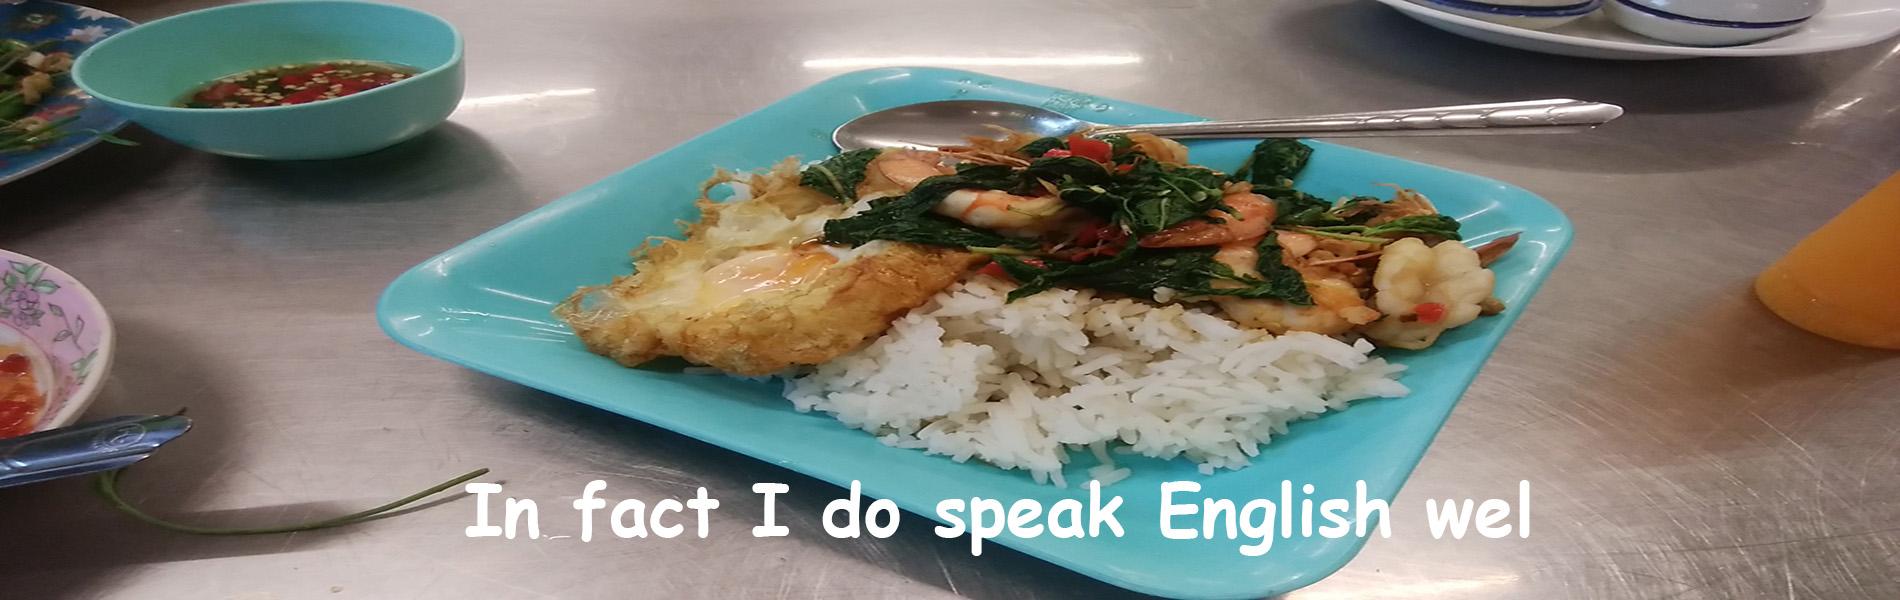 I do speak English well